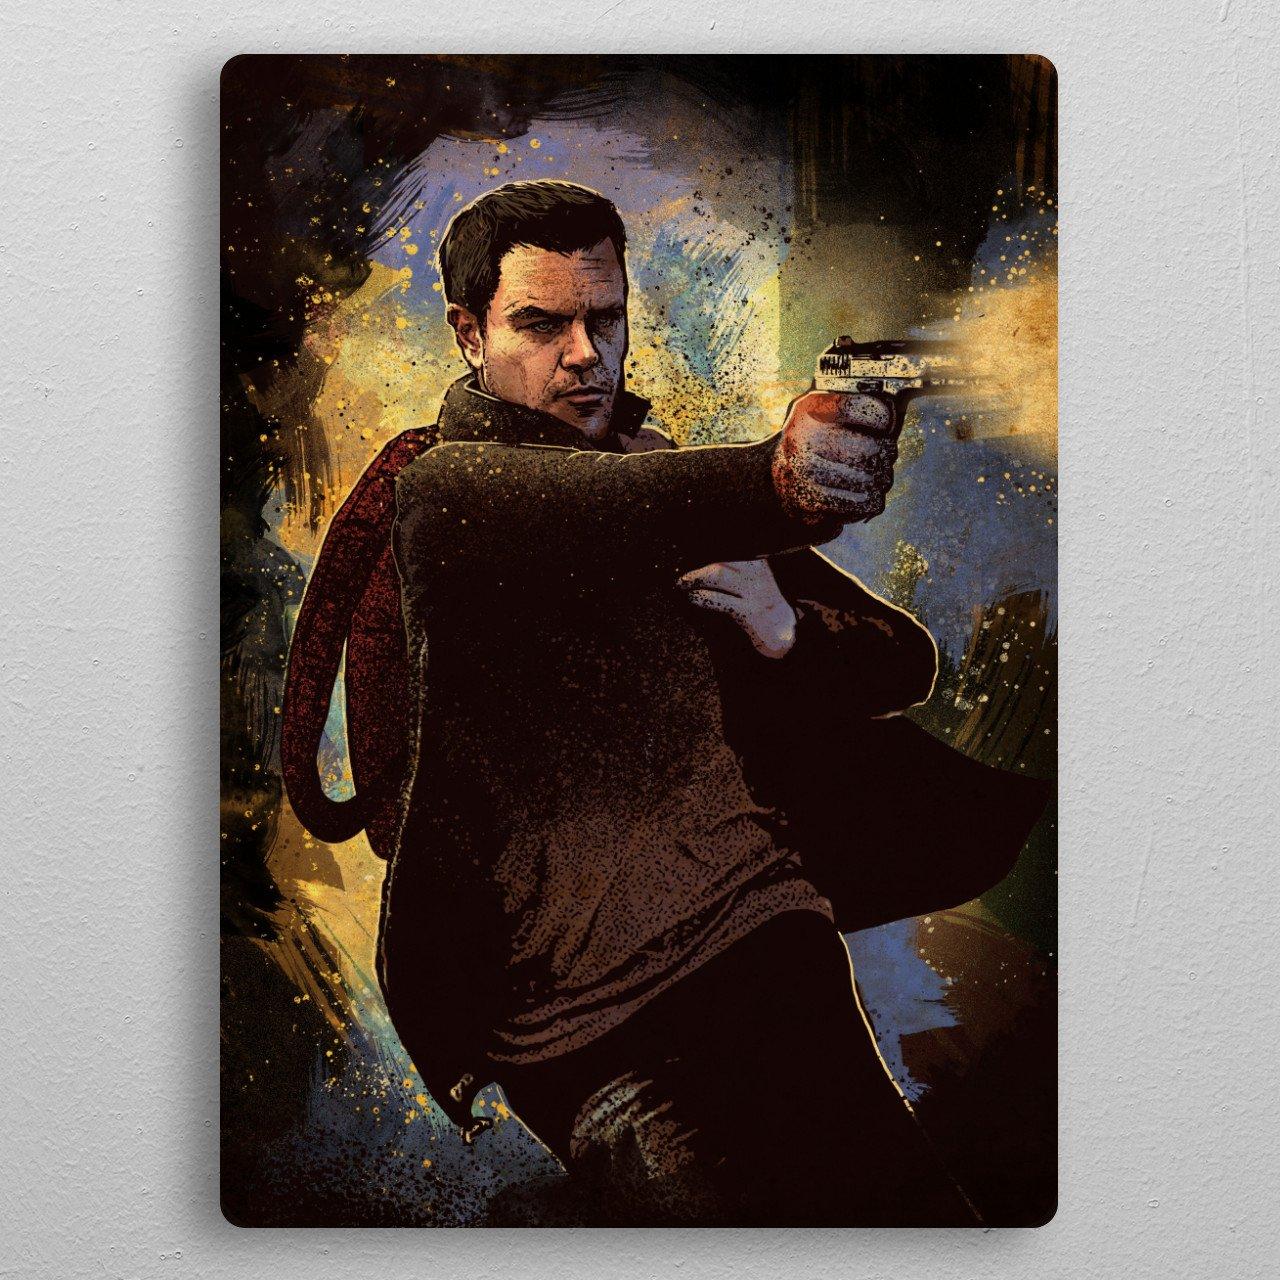 Jason Bourne pocket-size metal print from Black box